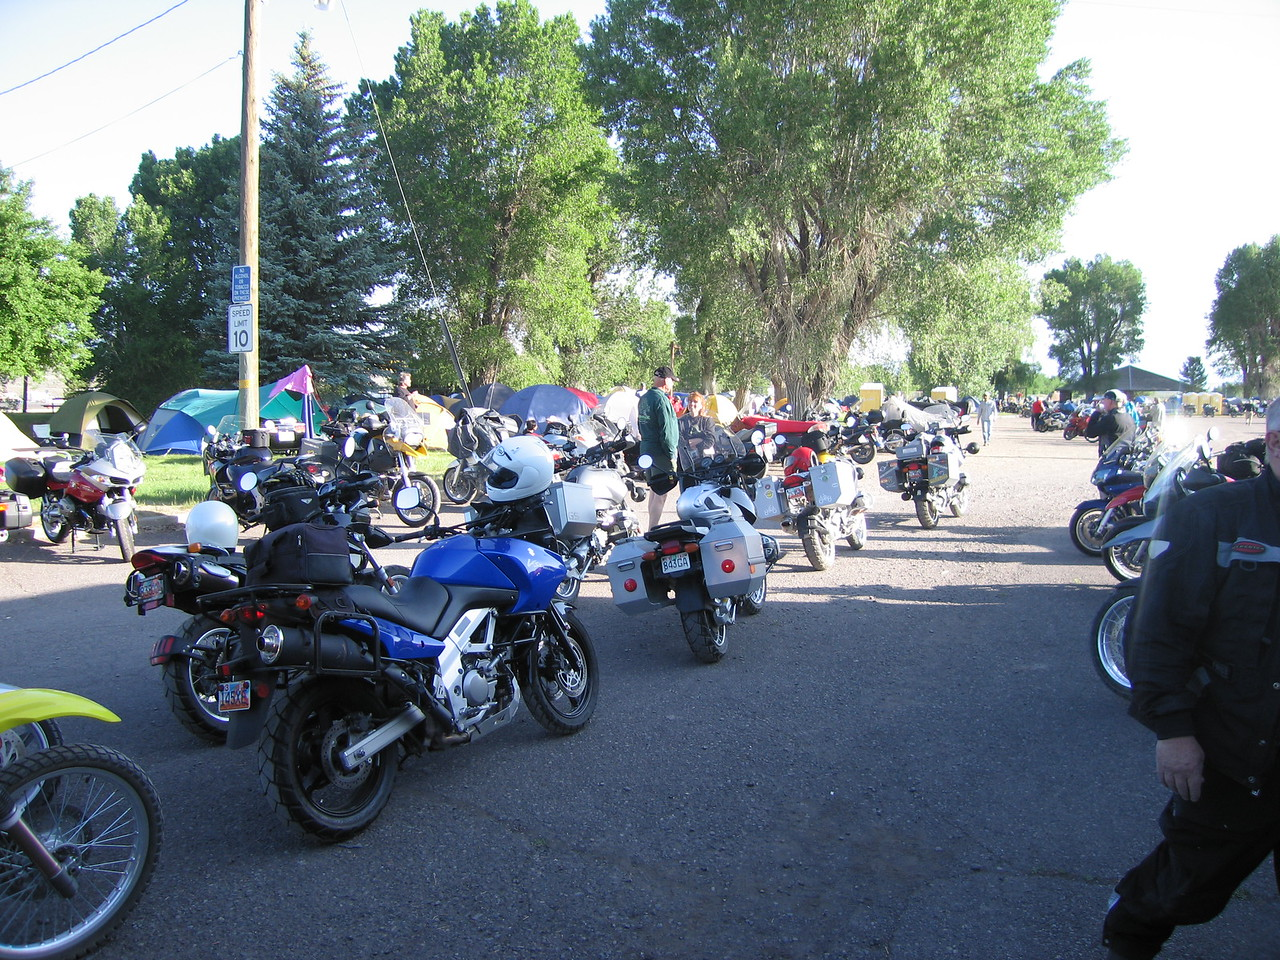 Dual sport bikes line up